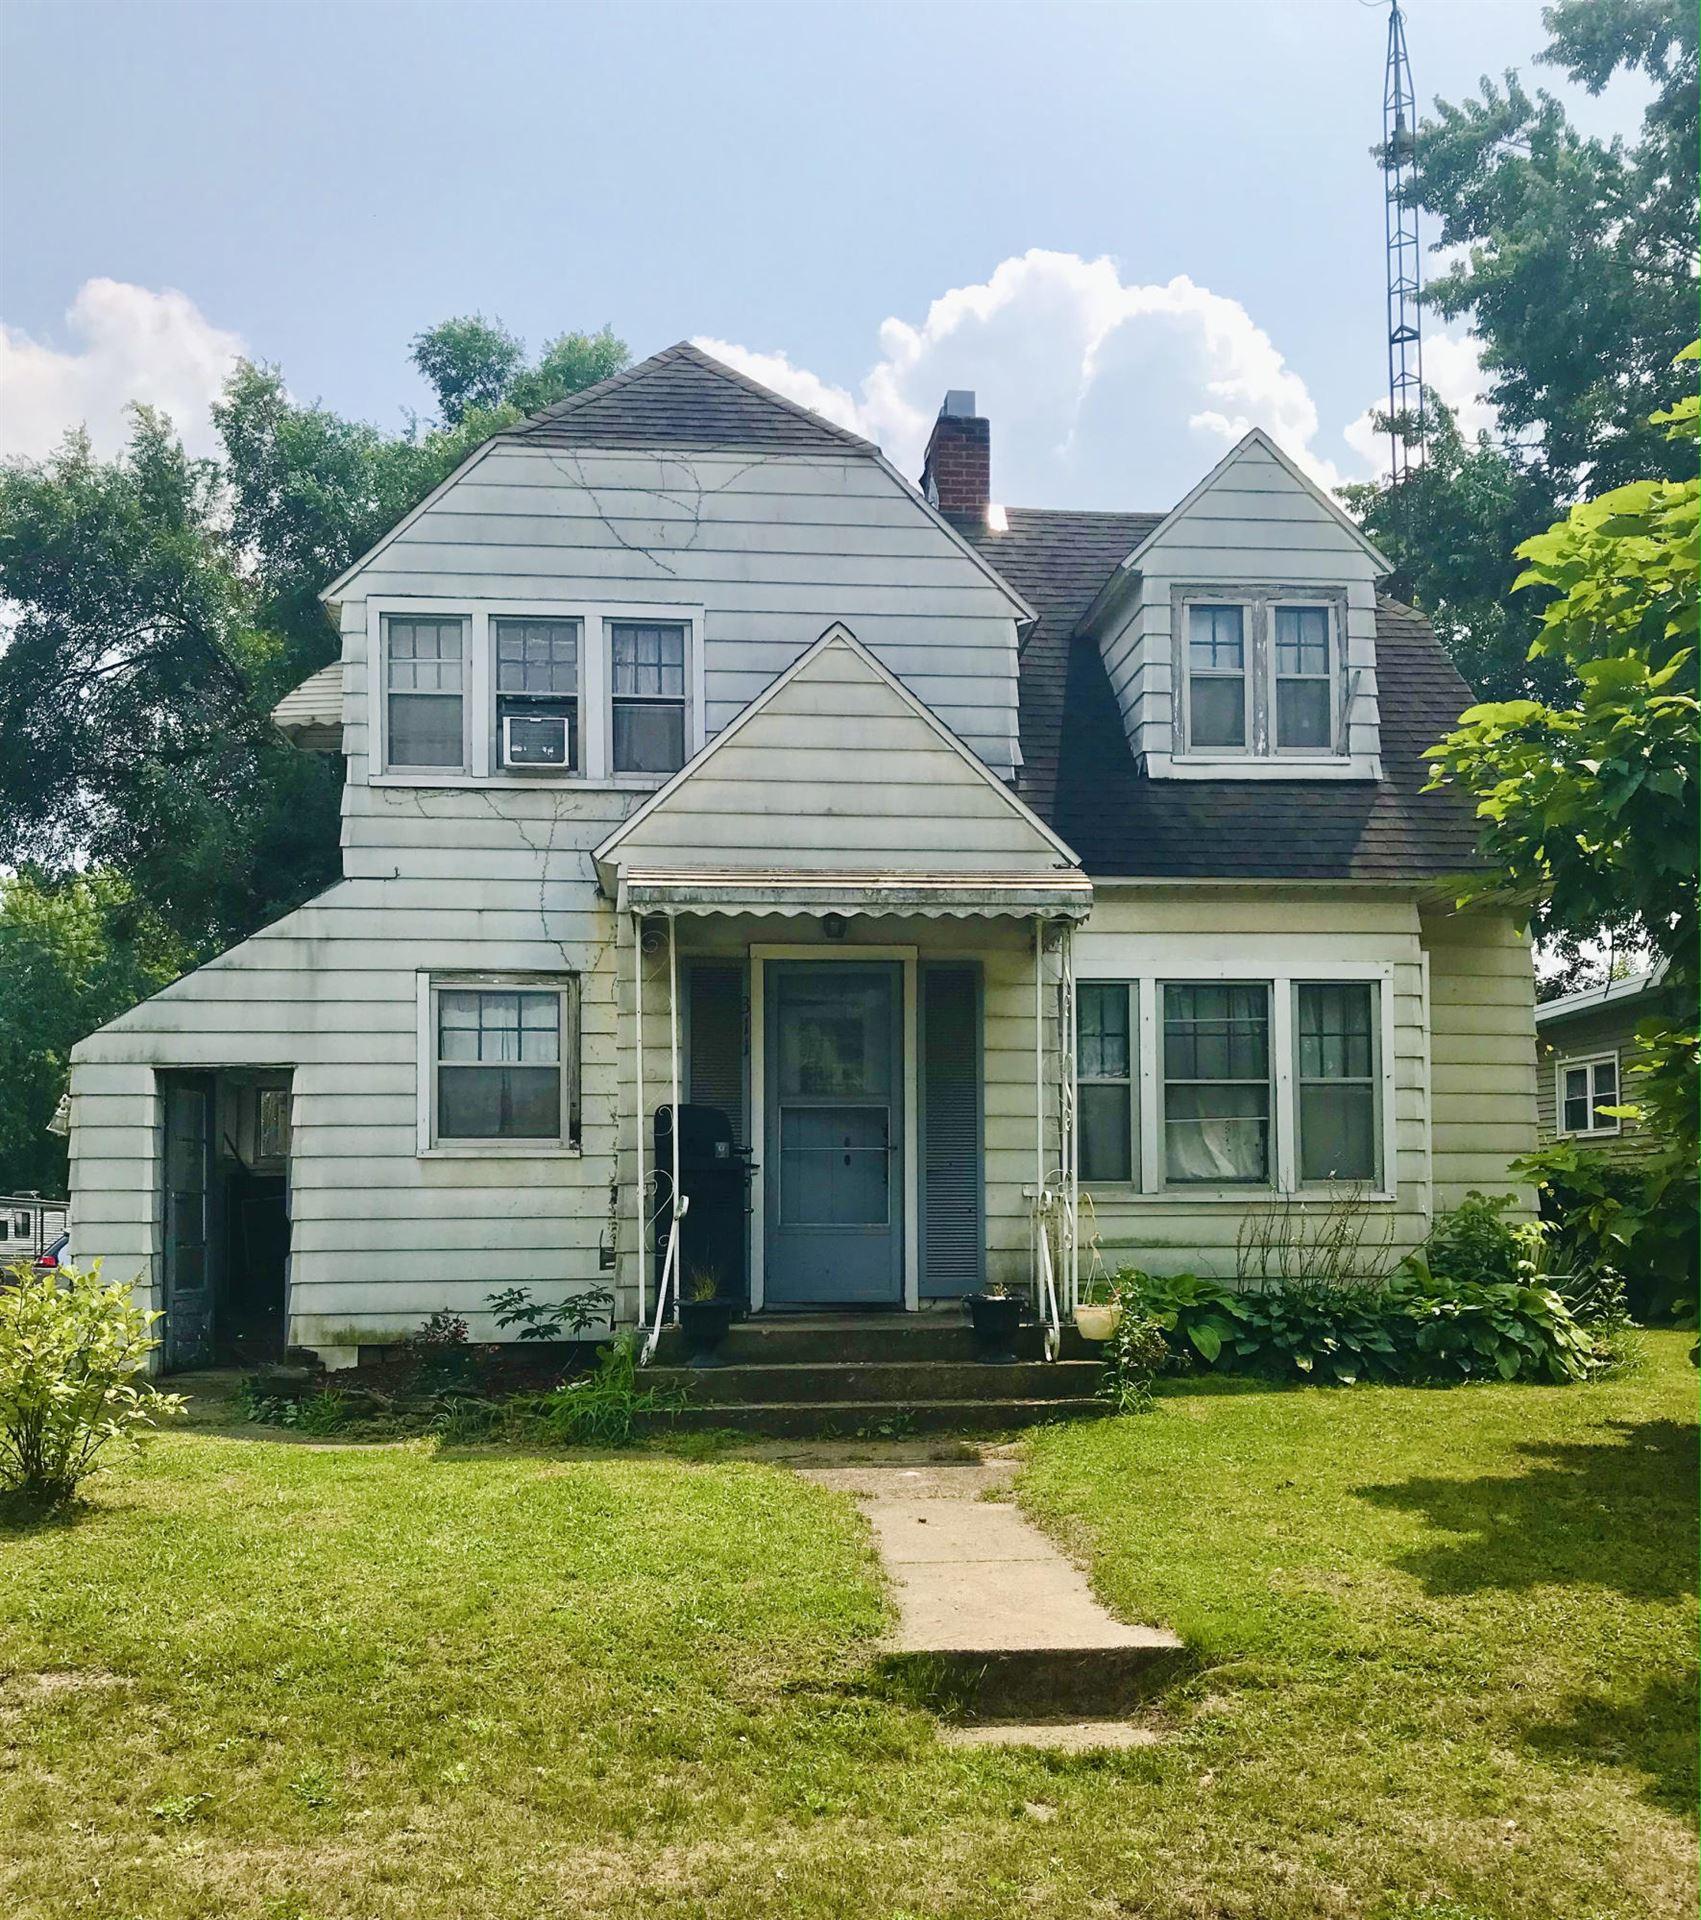 311 E Mcdevitt Avenue, Jackson, MI 49203 - MLS#: 21099649